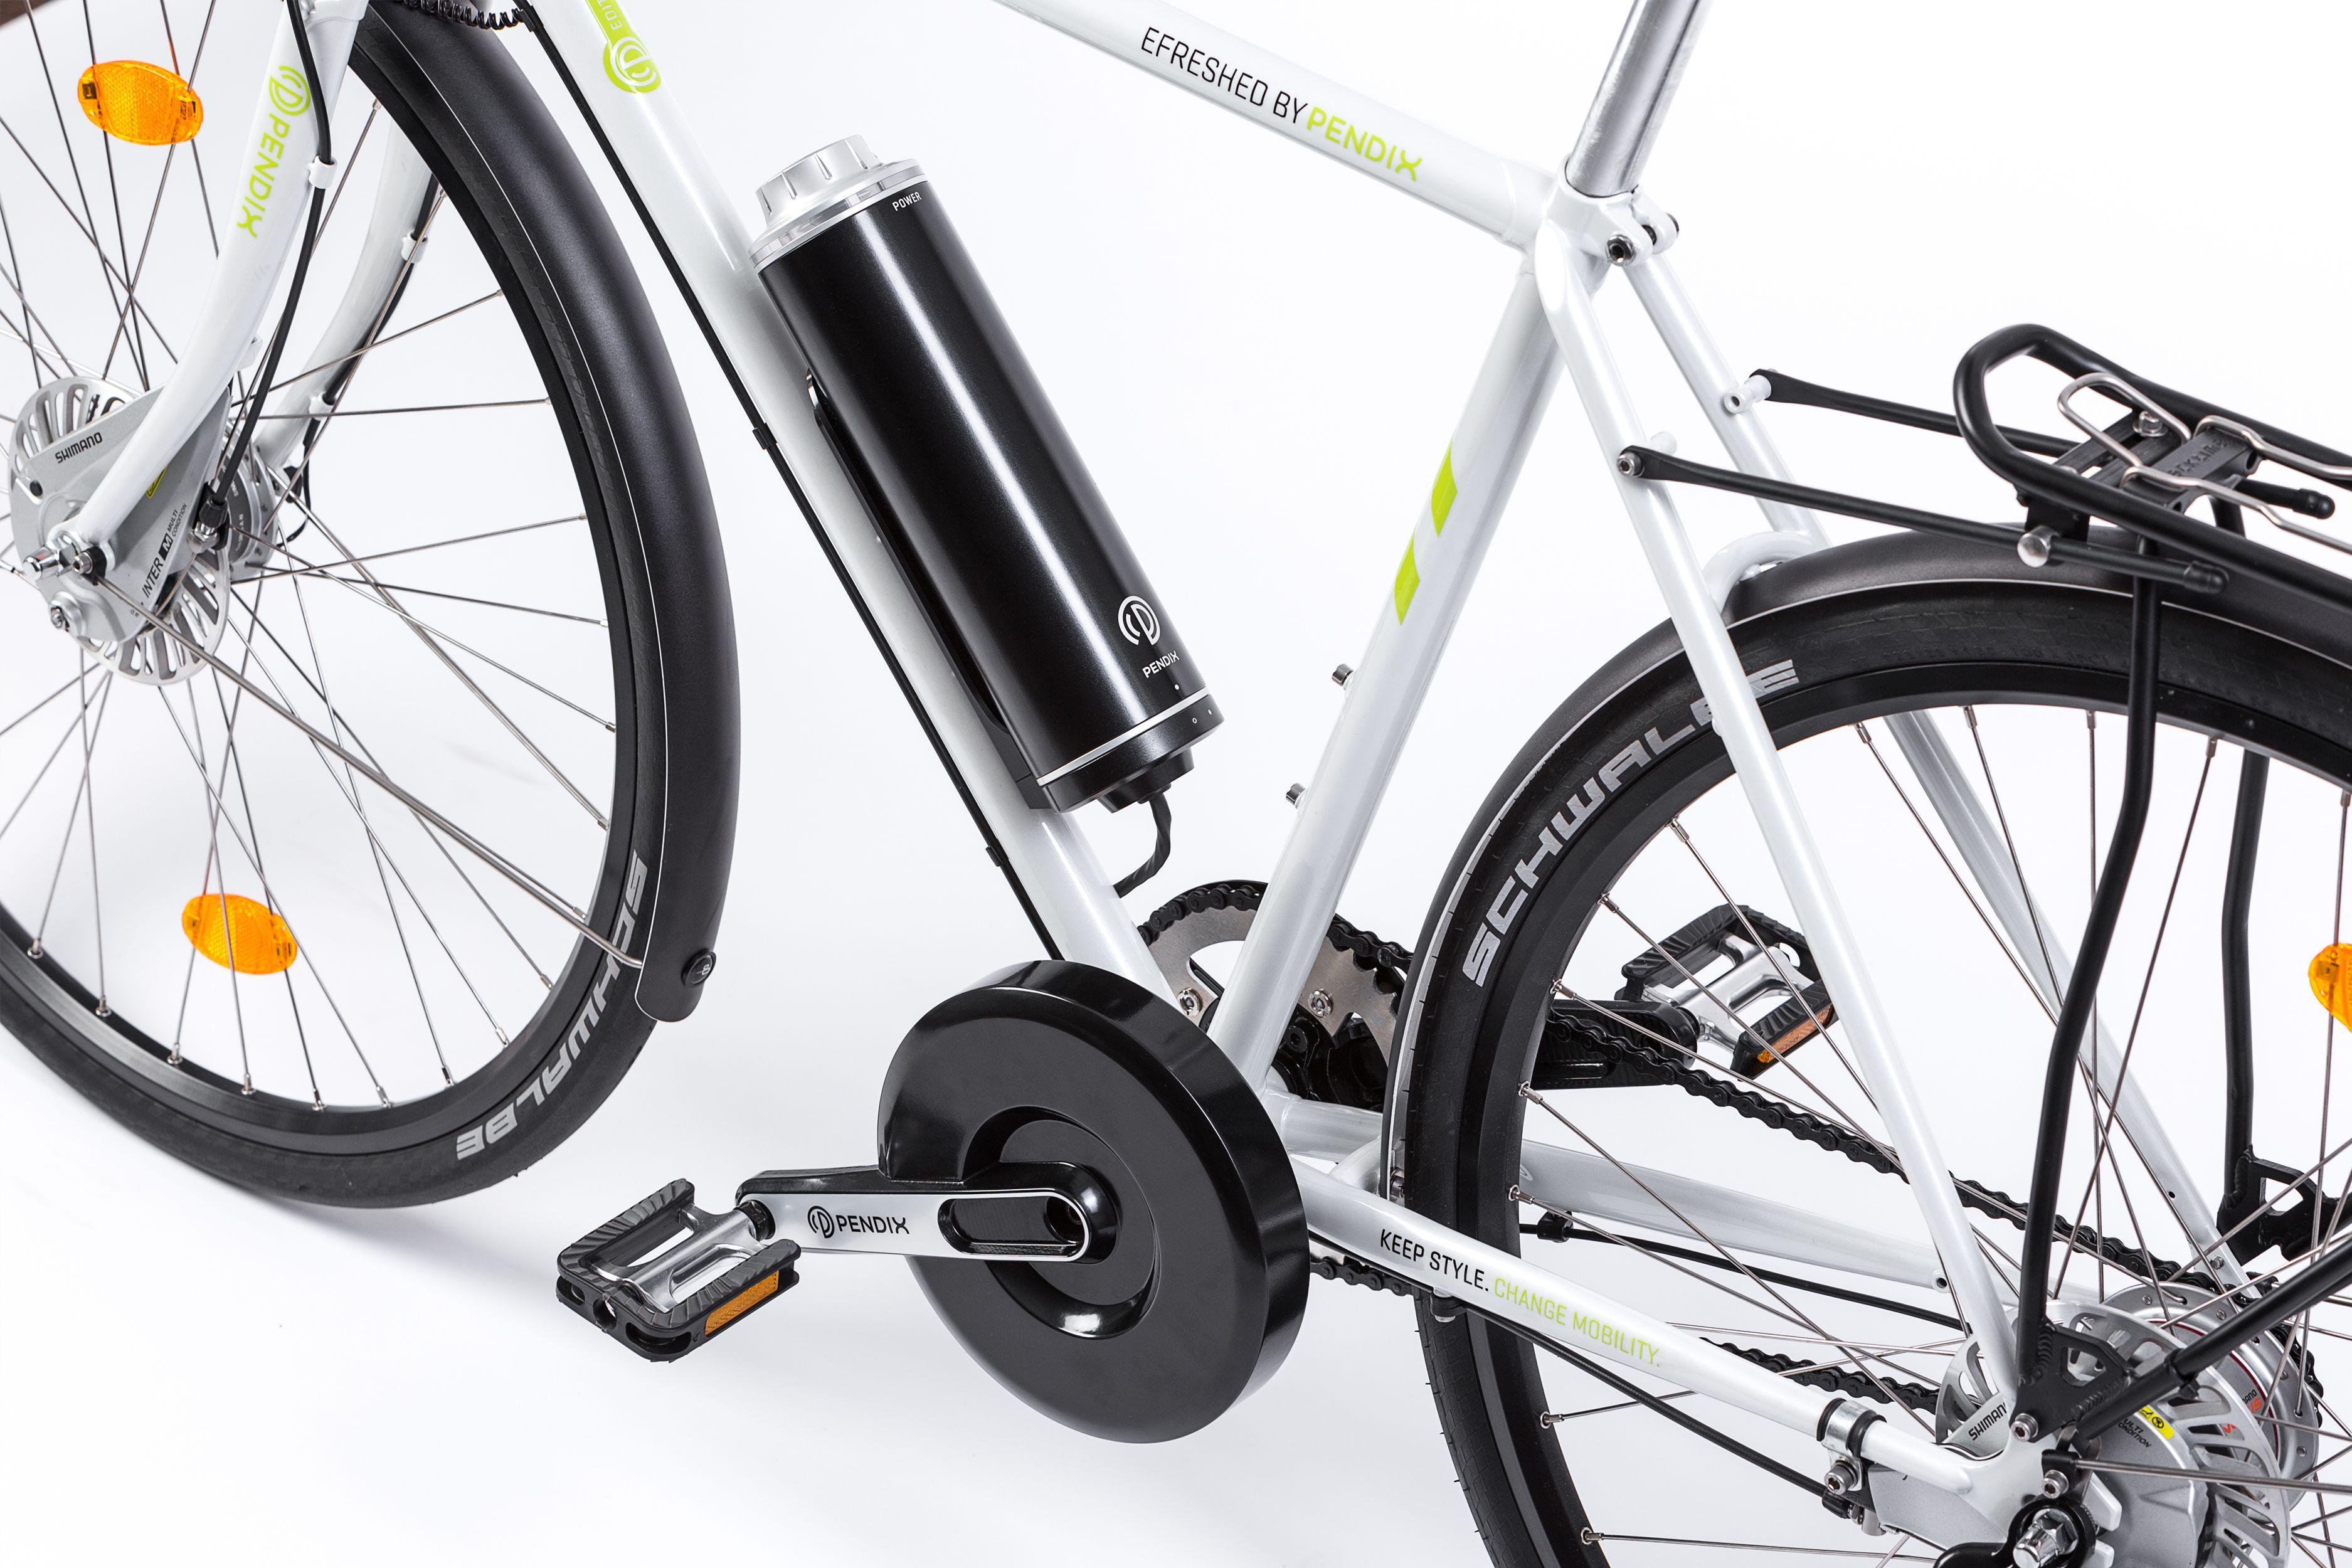 Großartig Plasti Dip Fahrradrahmen Fotos - Bilderrahmen Ideen ...